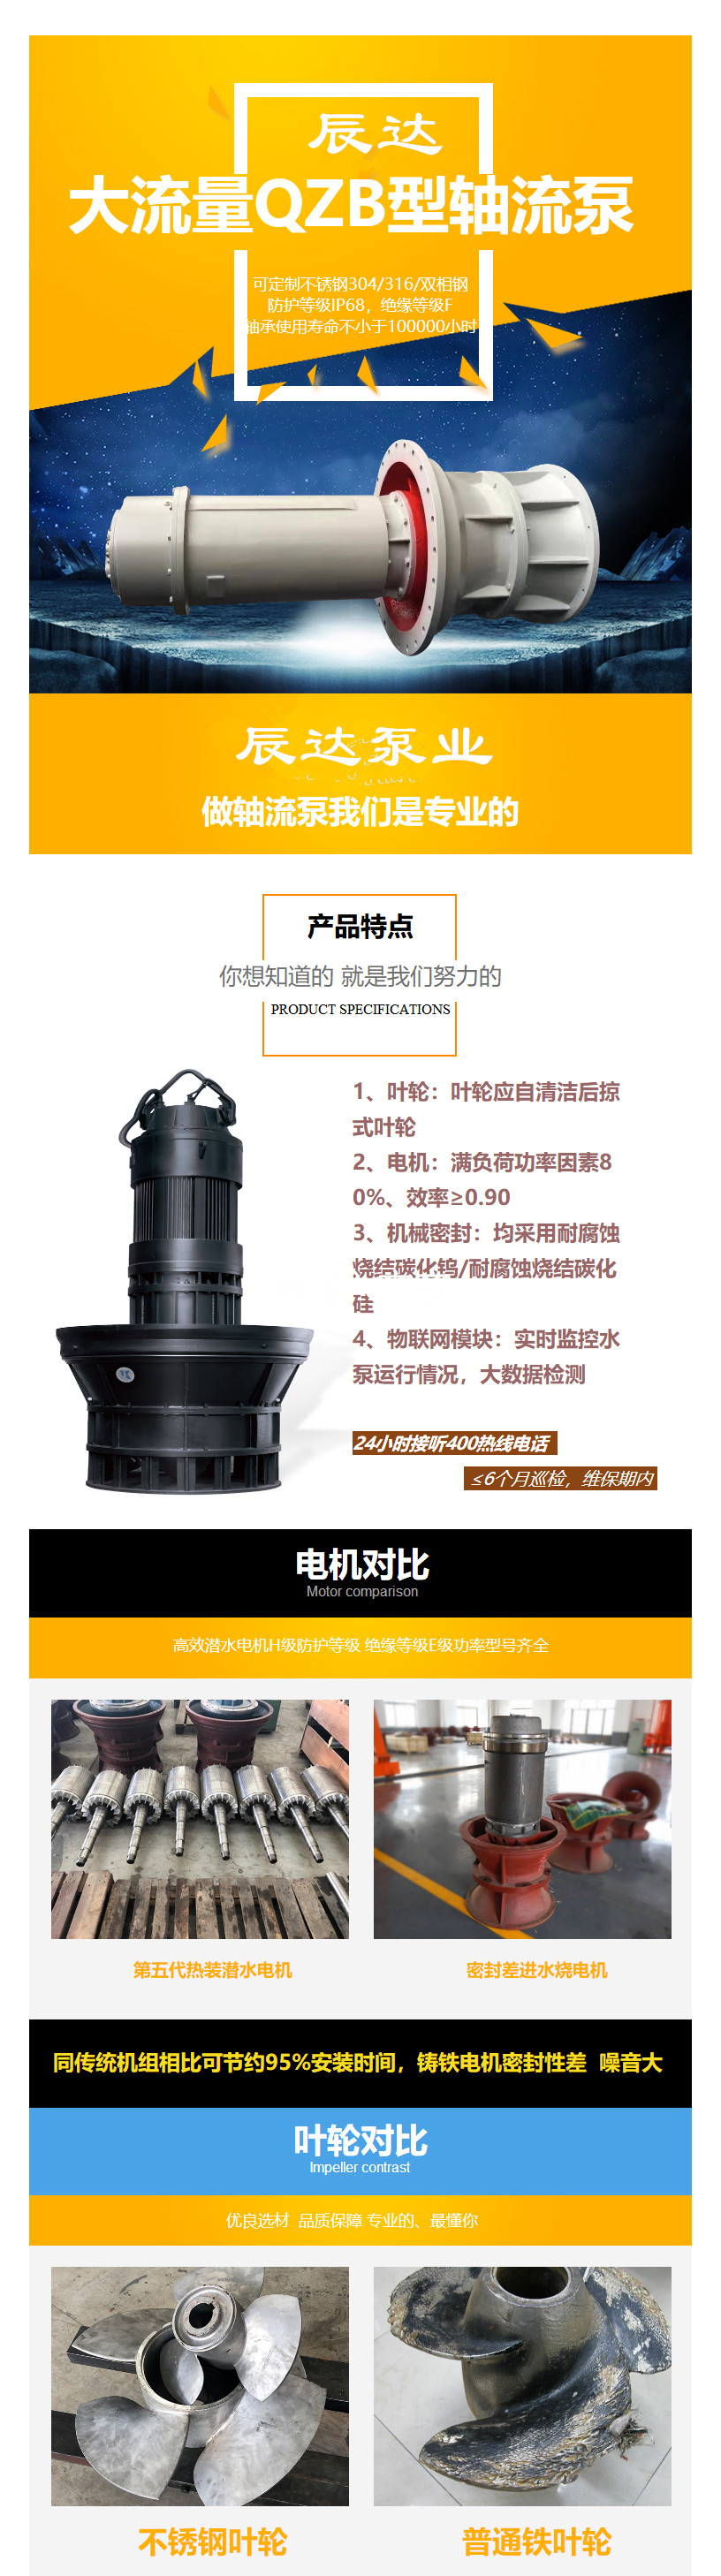 QZB型轴流泵01_副本.jpg